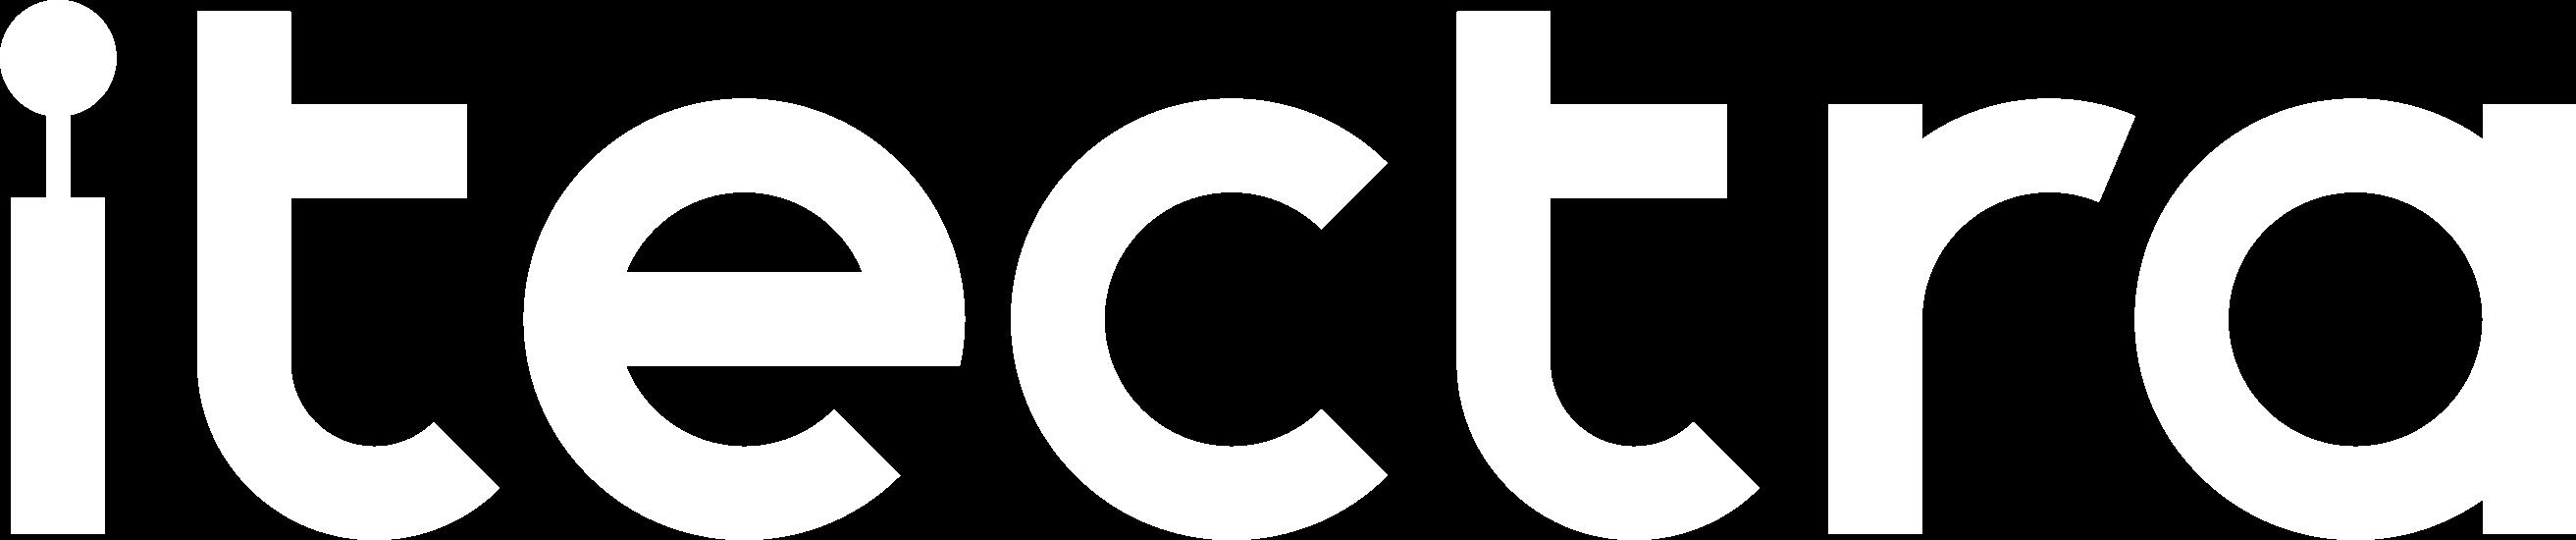 Itectra logo